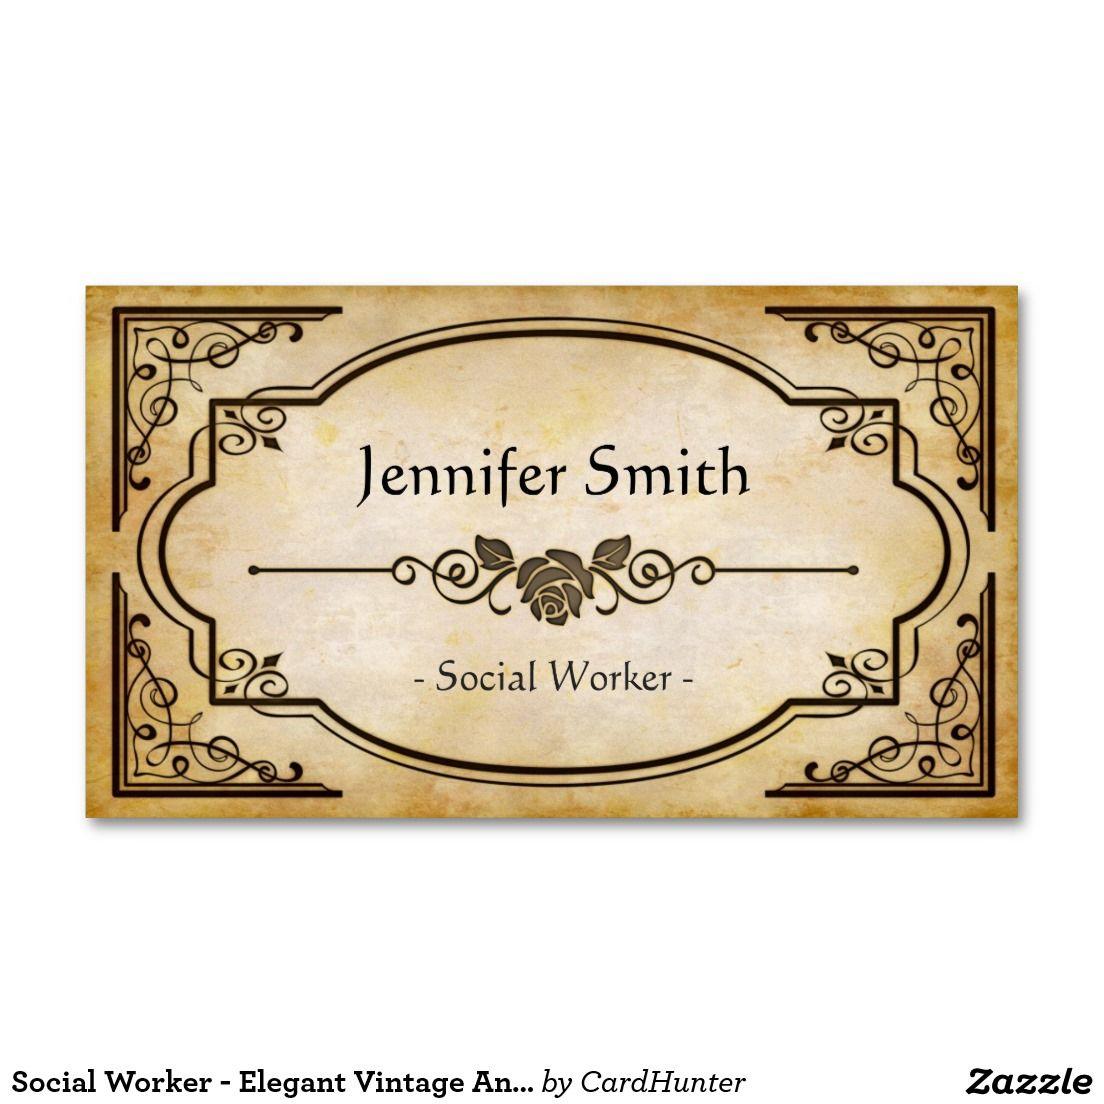 Antique Store Business Cards   Arts - Arts